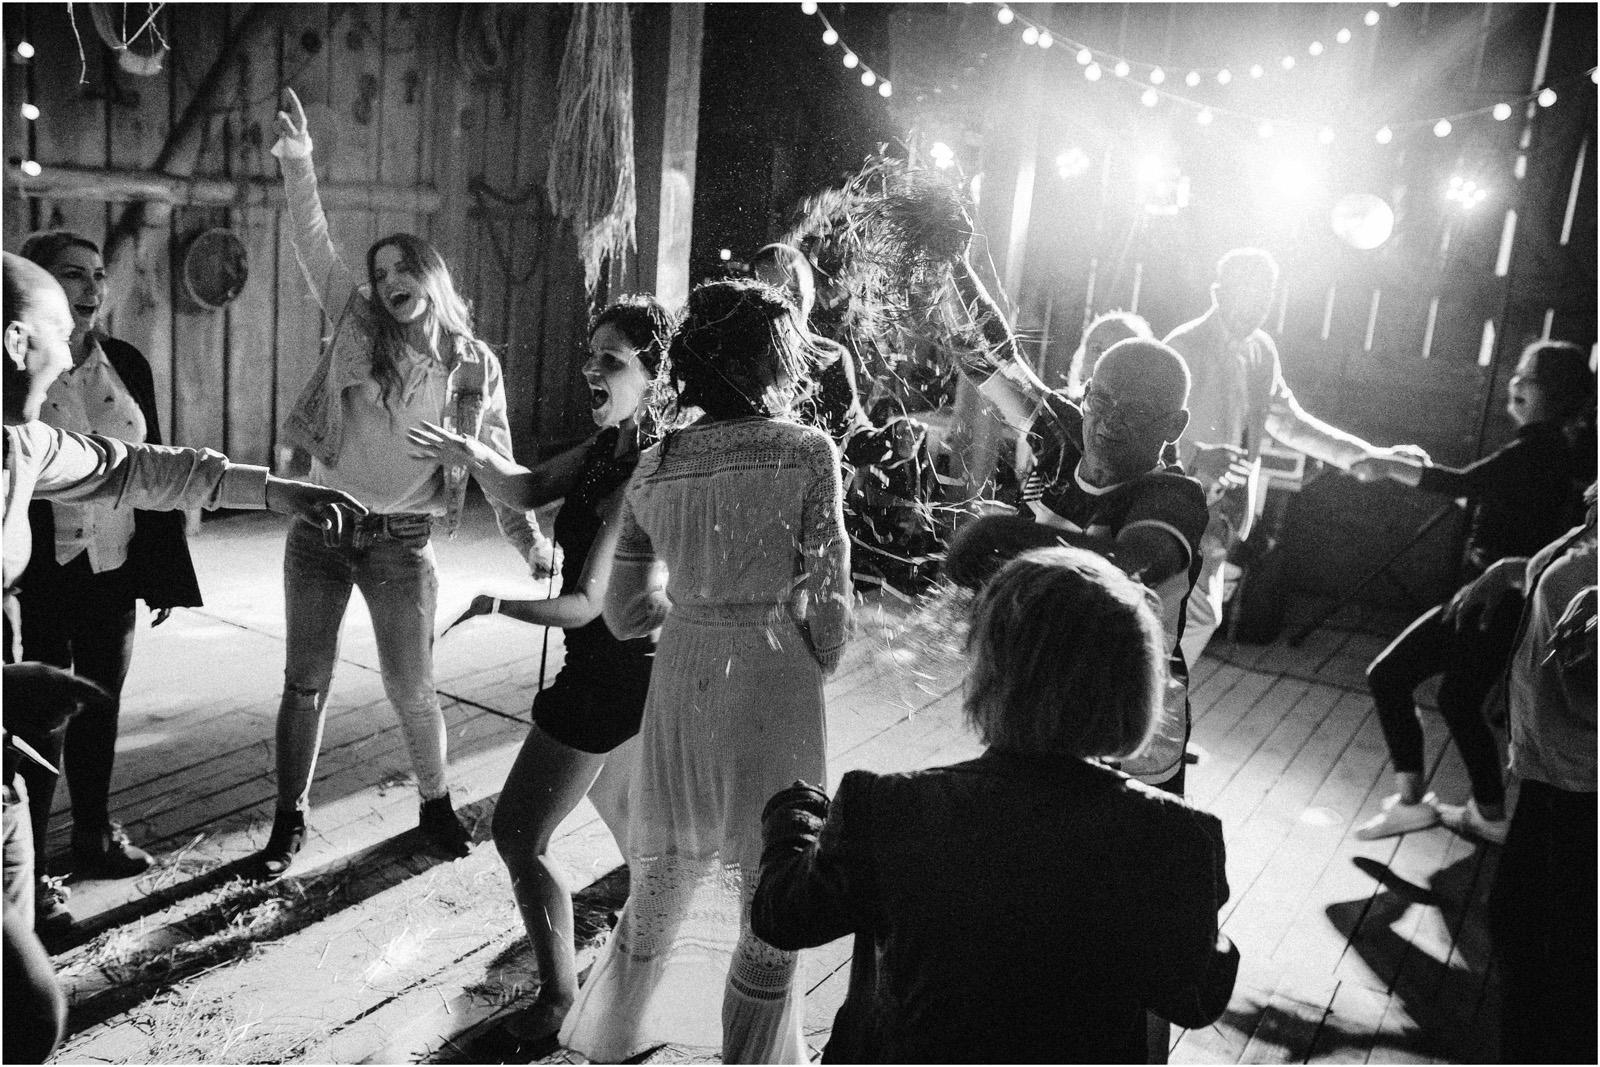 Agatka & Mati | garden party i impreza w stodole 79